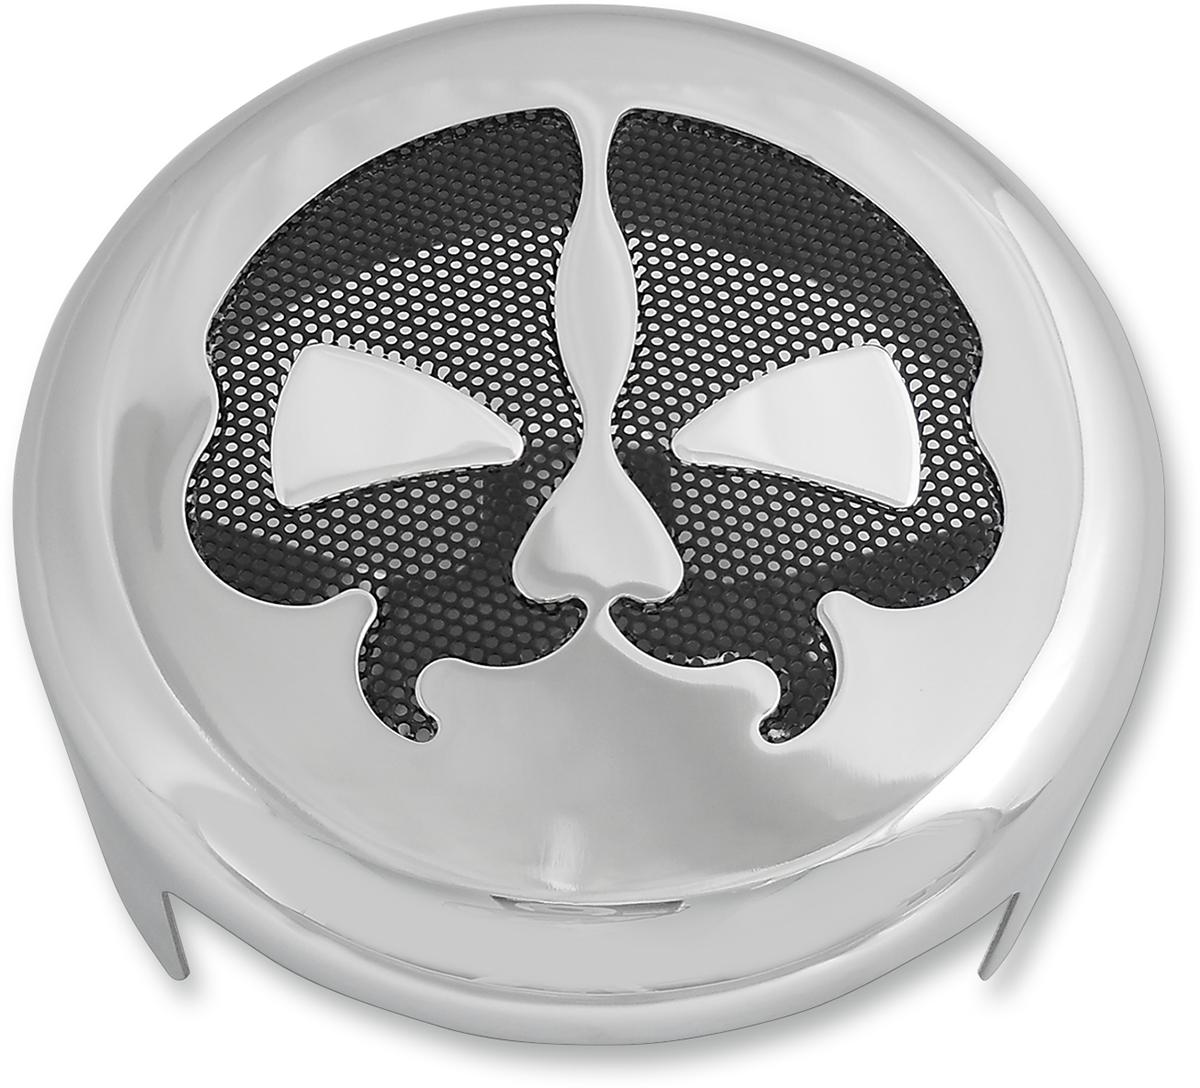 "Drag Specialties 4 5/8"" Chrome Steel Split Skull Motorcycle Horn Cover"